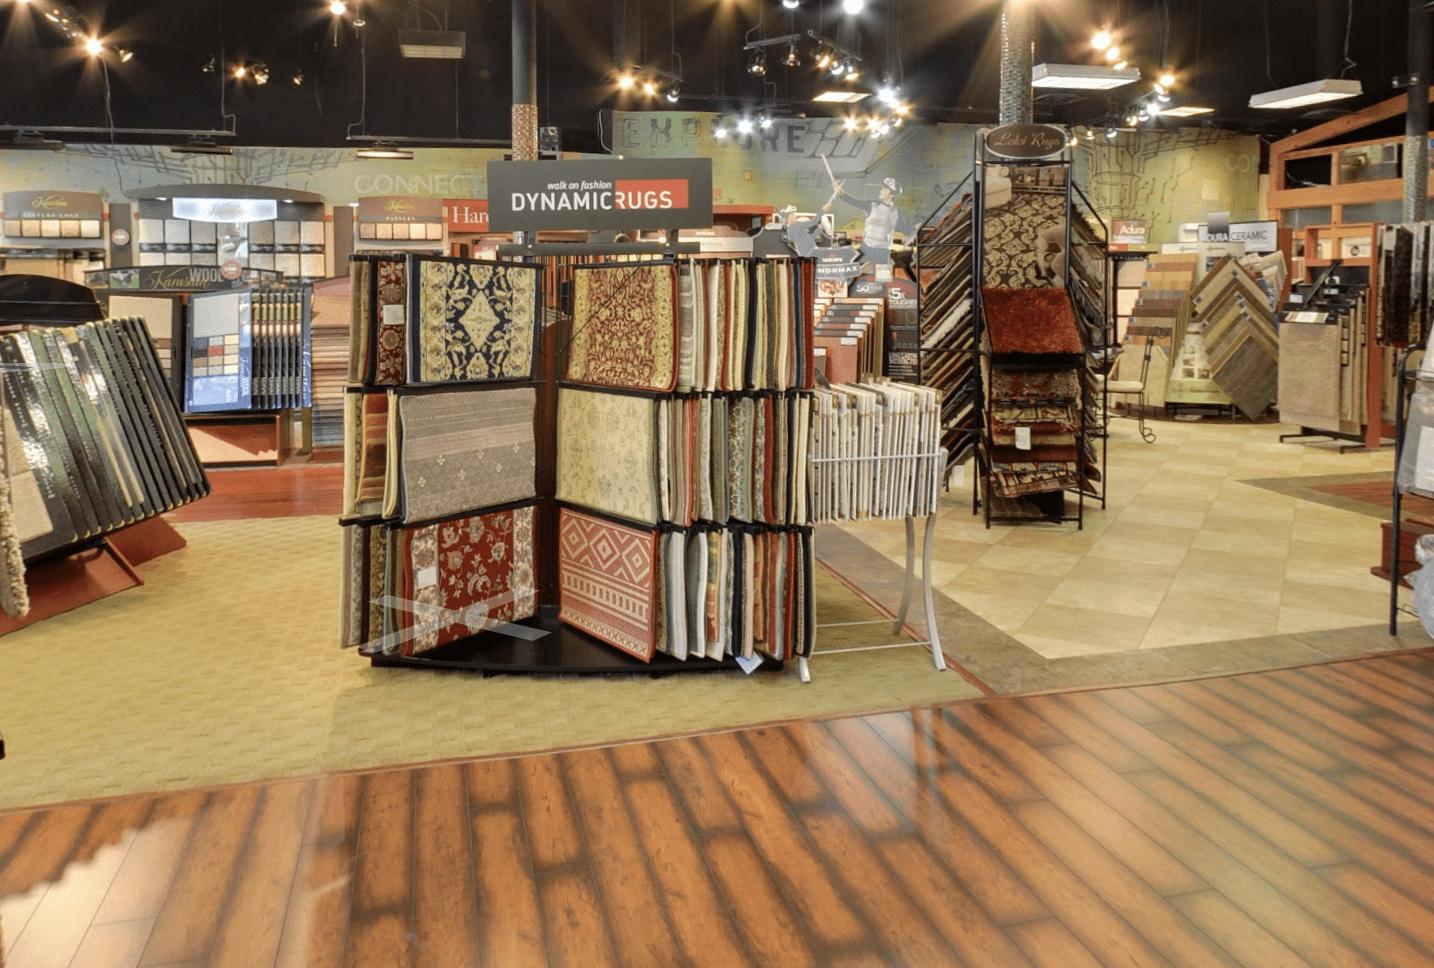 Carpet & Floors Market showroom near Indian Head, MD